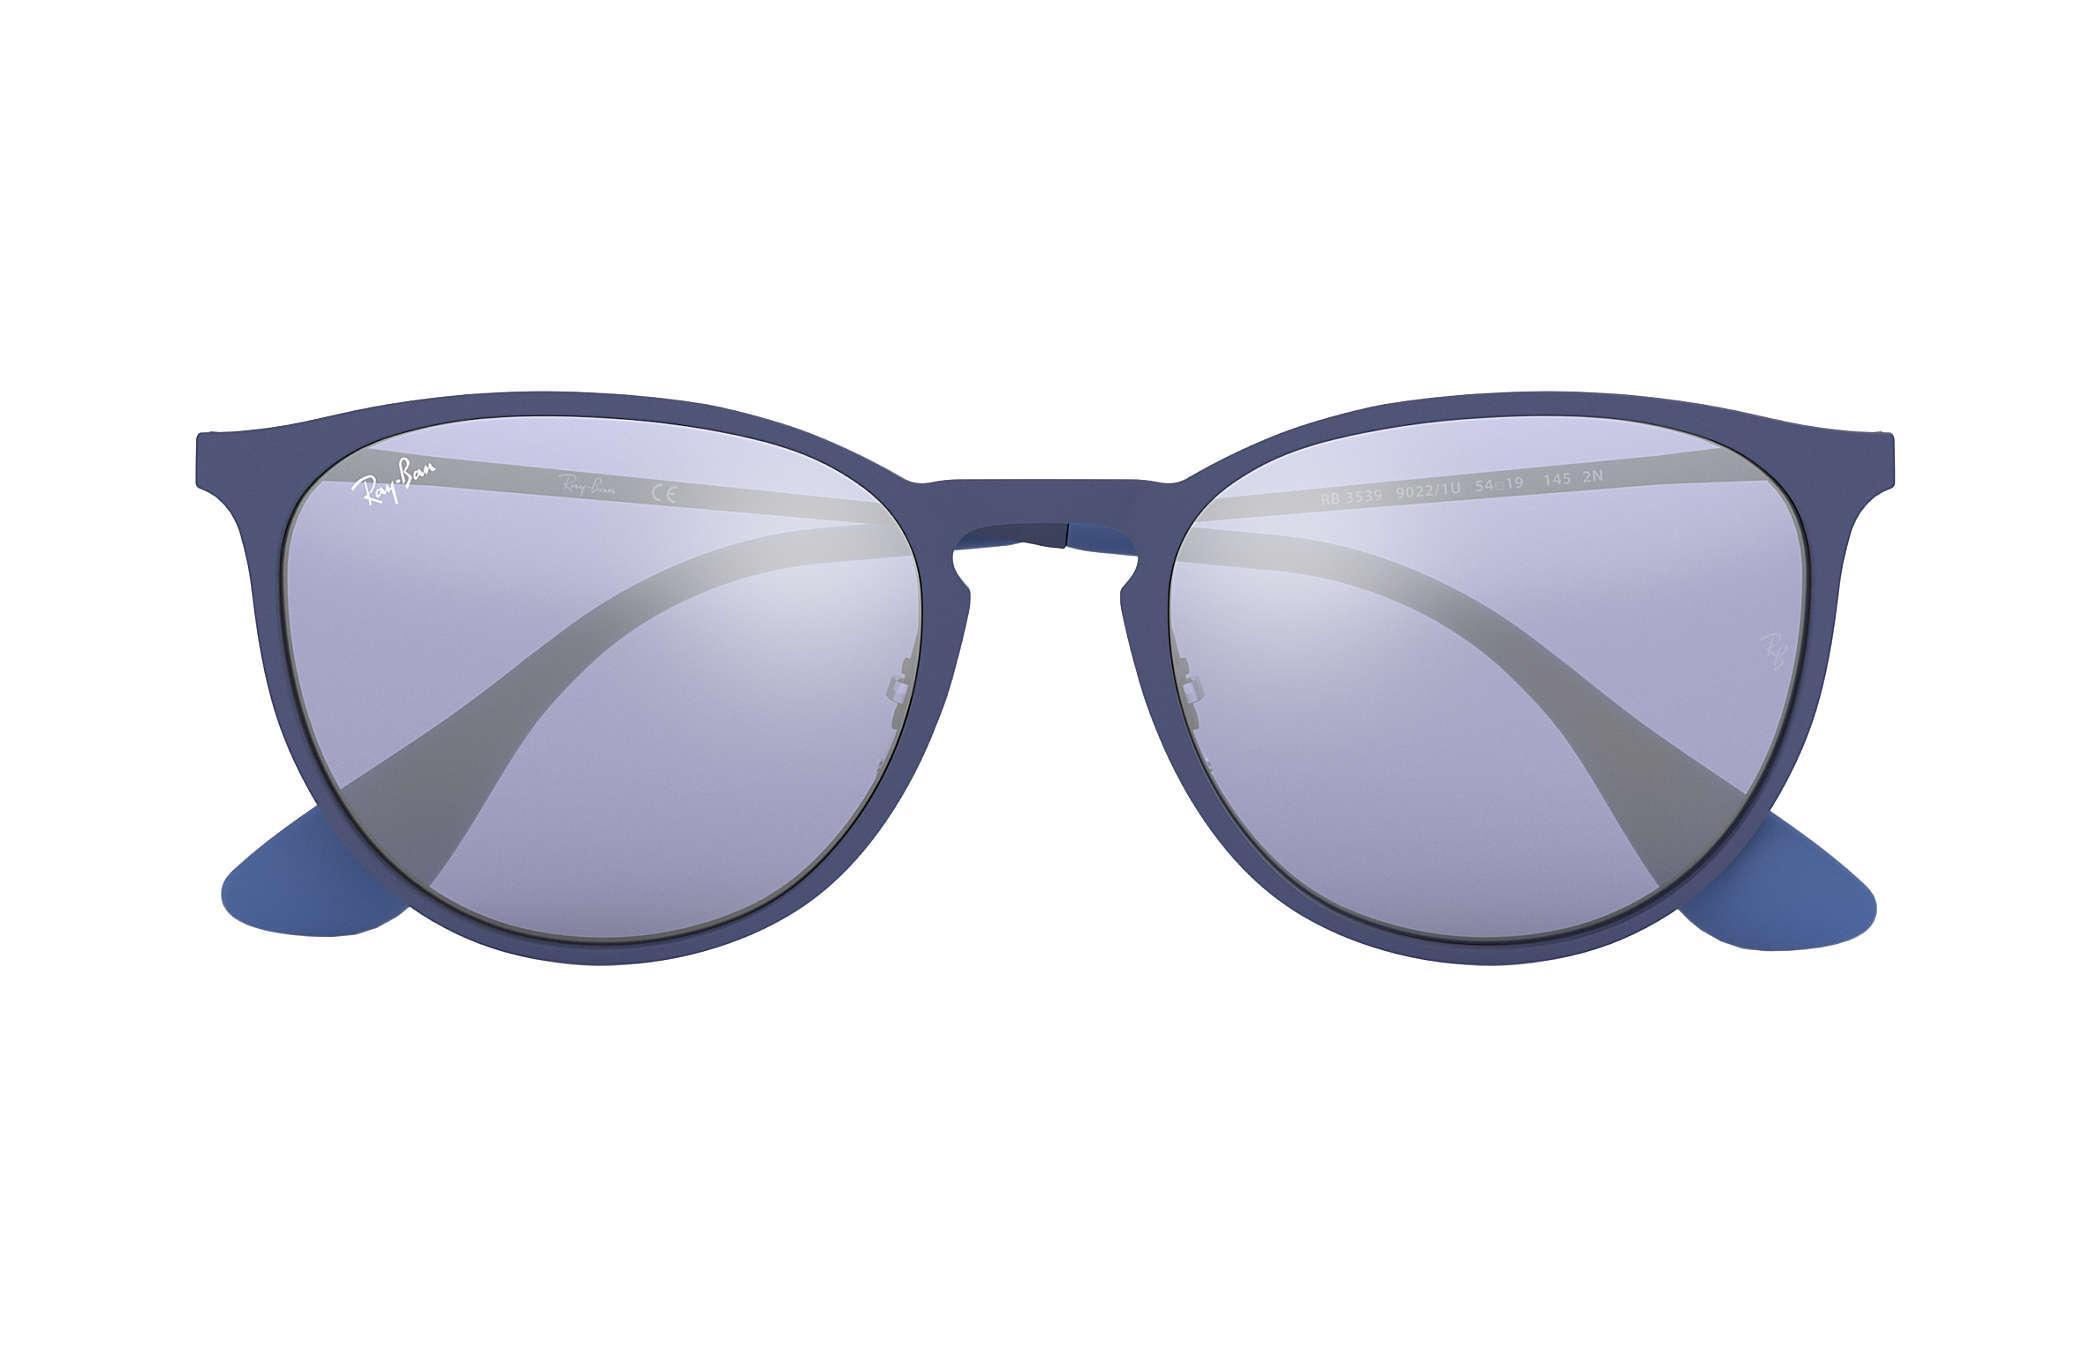 c3505ef0626d7 Ray-Ban Erika Metal RB3539 Blue - Metal - Grey Lenses ...